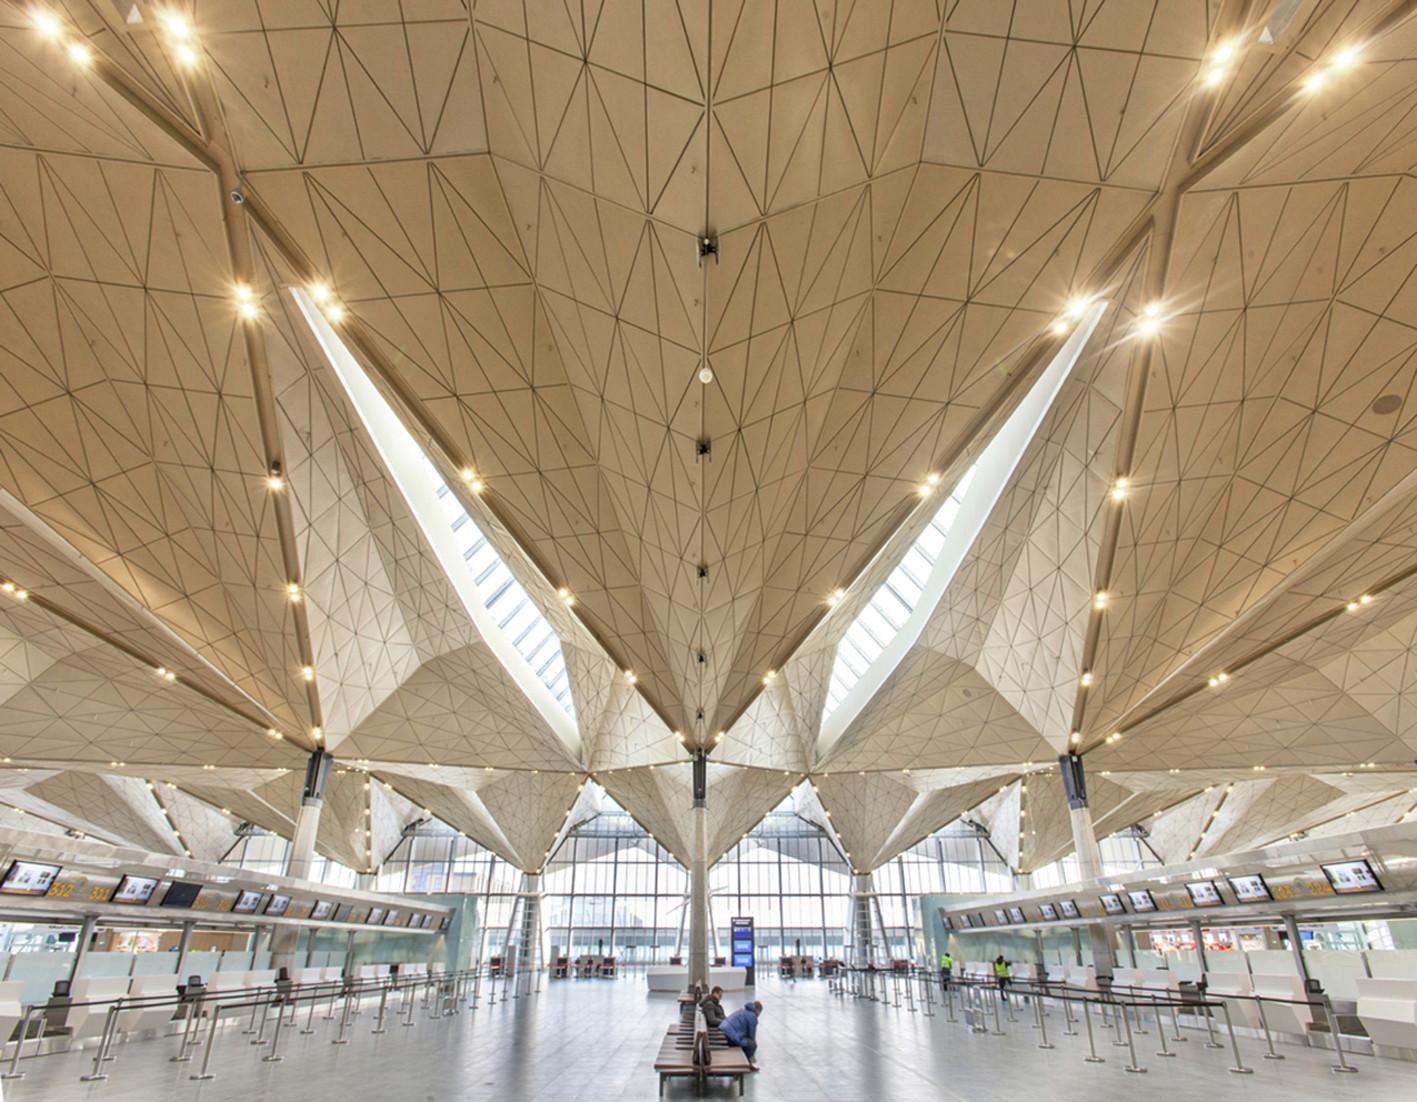 Pulkovo International Airport / Grimshaw Architects + Ramboll + Pascall+Watson, Courtesy of Grimshaw Architects